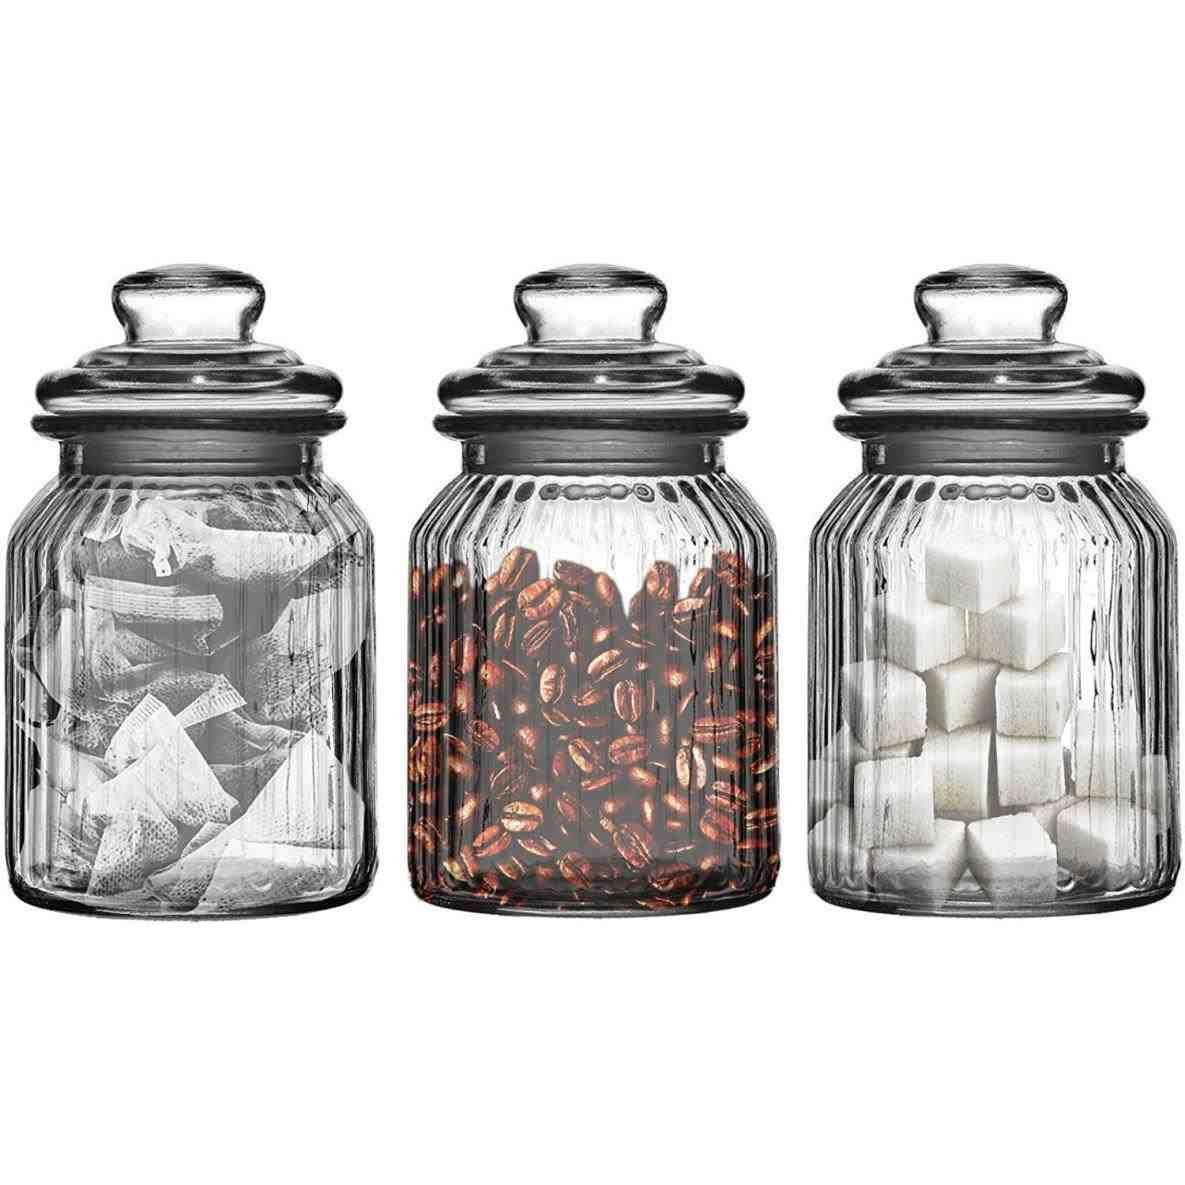 New Quirky Tea Coffee Sugar Jars At Temasistemi Net Tea Coffee Sugar Jars Jar Storage Glass Storage Jars